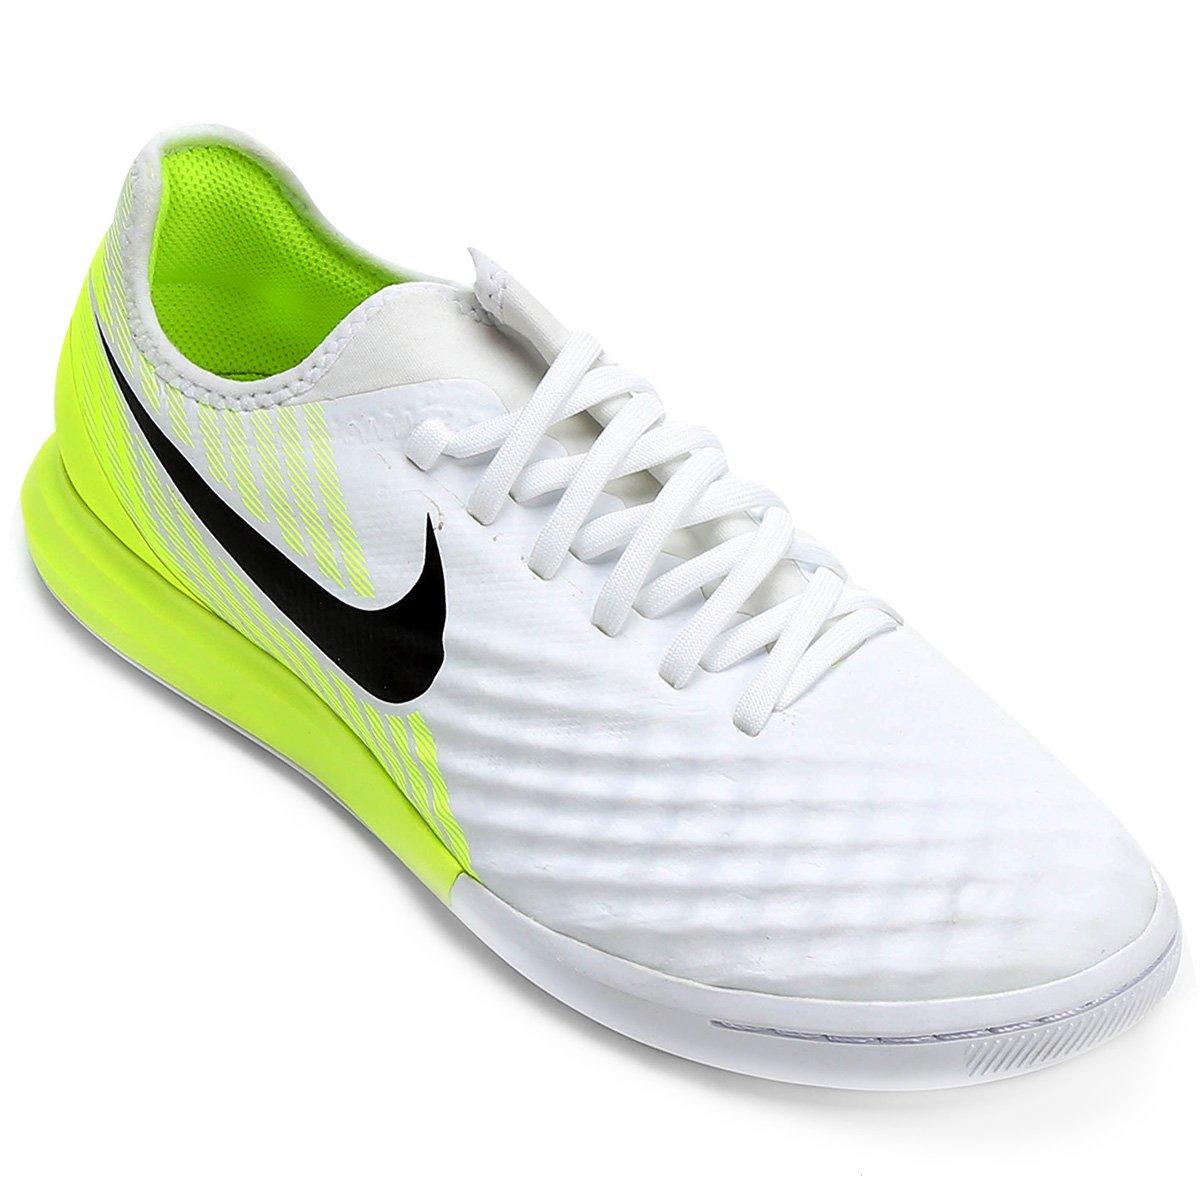 9db8afacdc41b Chuteira Futsal Nike Magista Finale 2 IC - Compre Agora